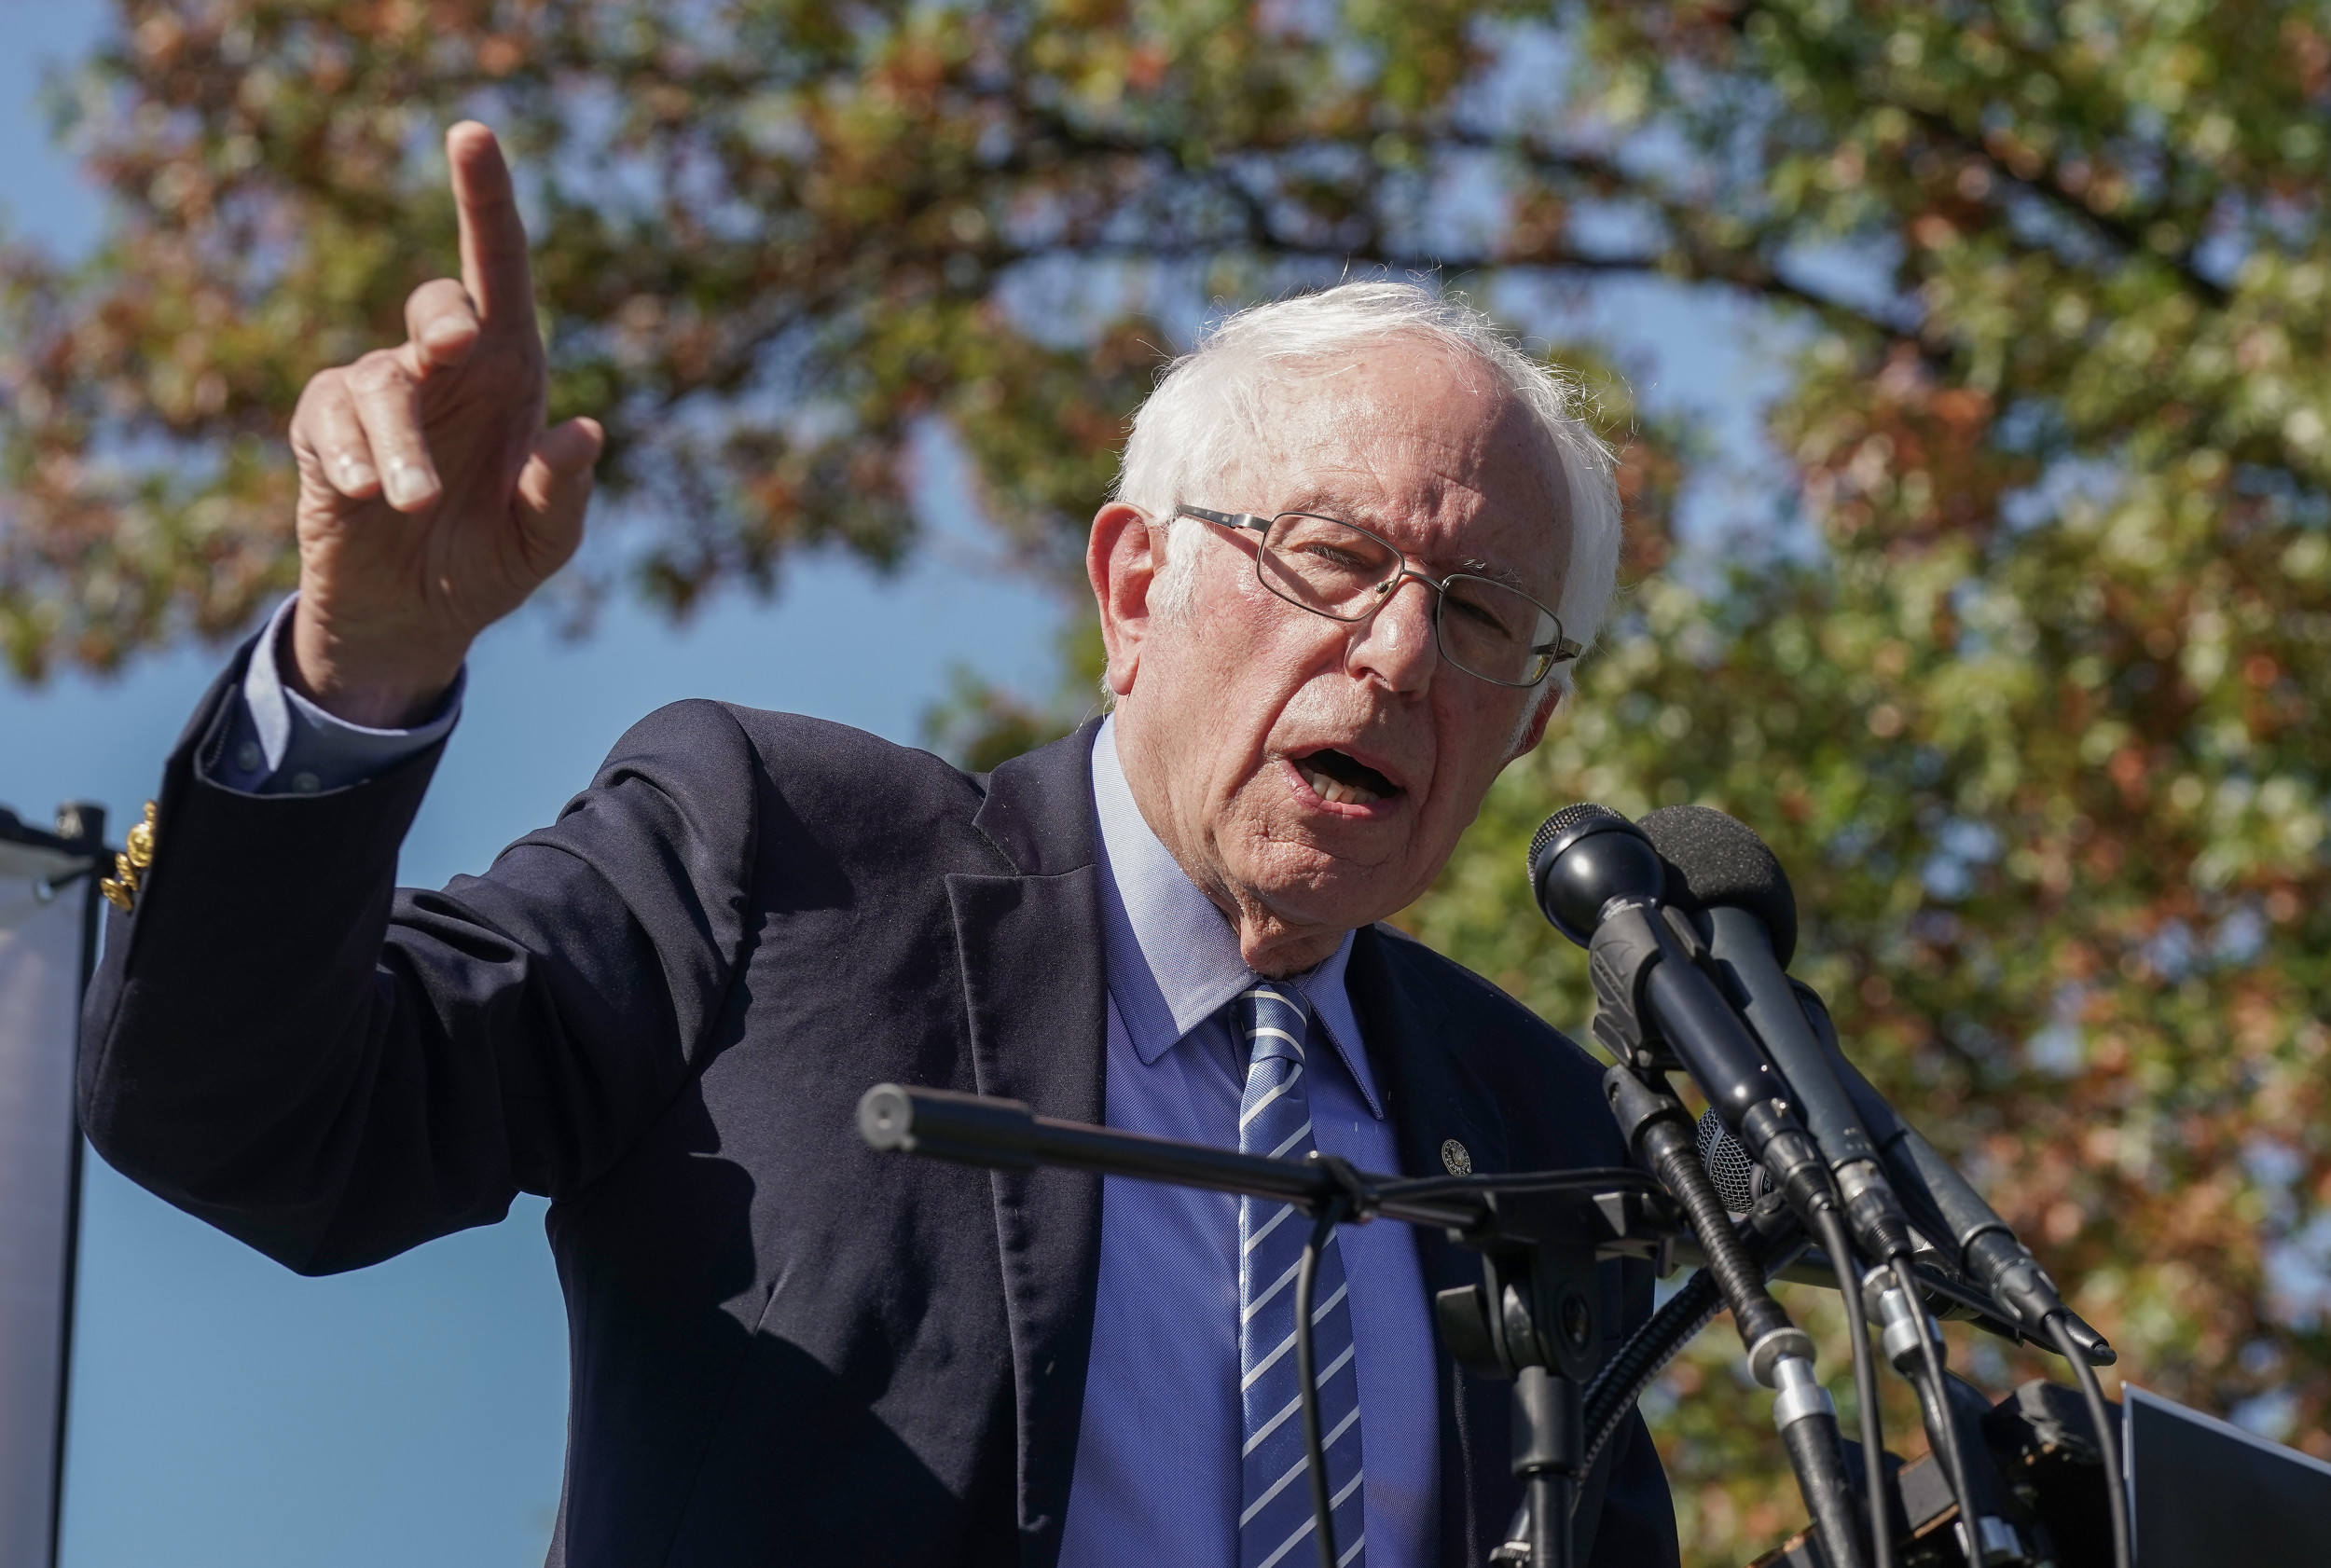 Bernie Sanders Says Democratic Party Has Become a 'Party of Coastal Elites'